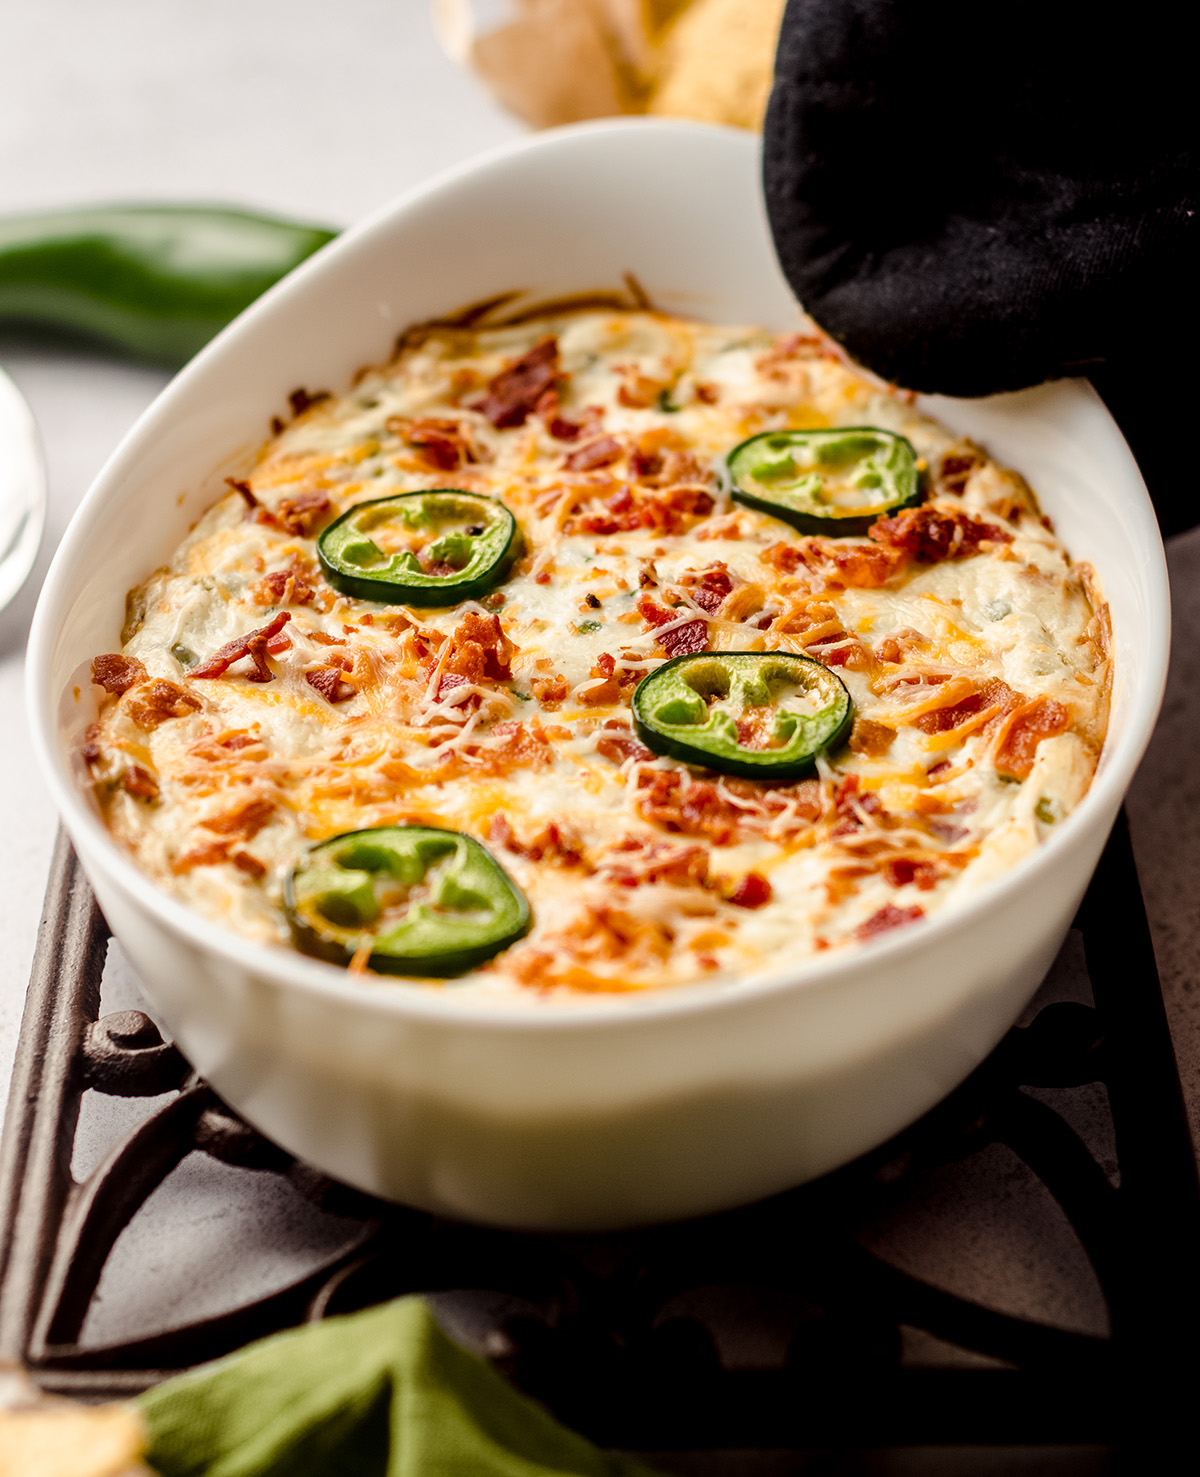 jalapeno cream cheese dip in a casserole dish